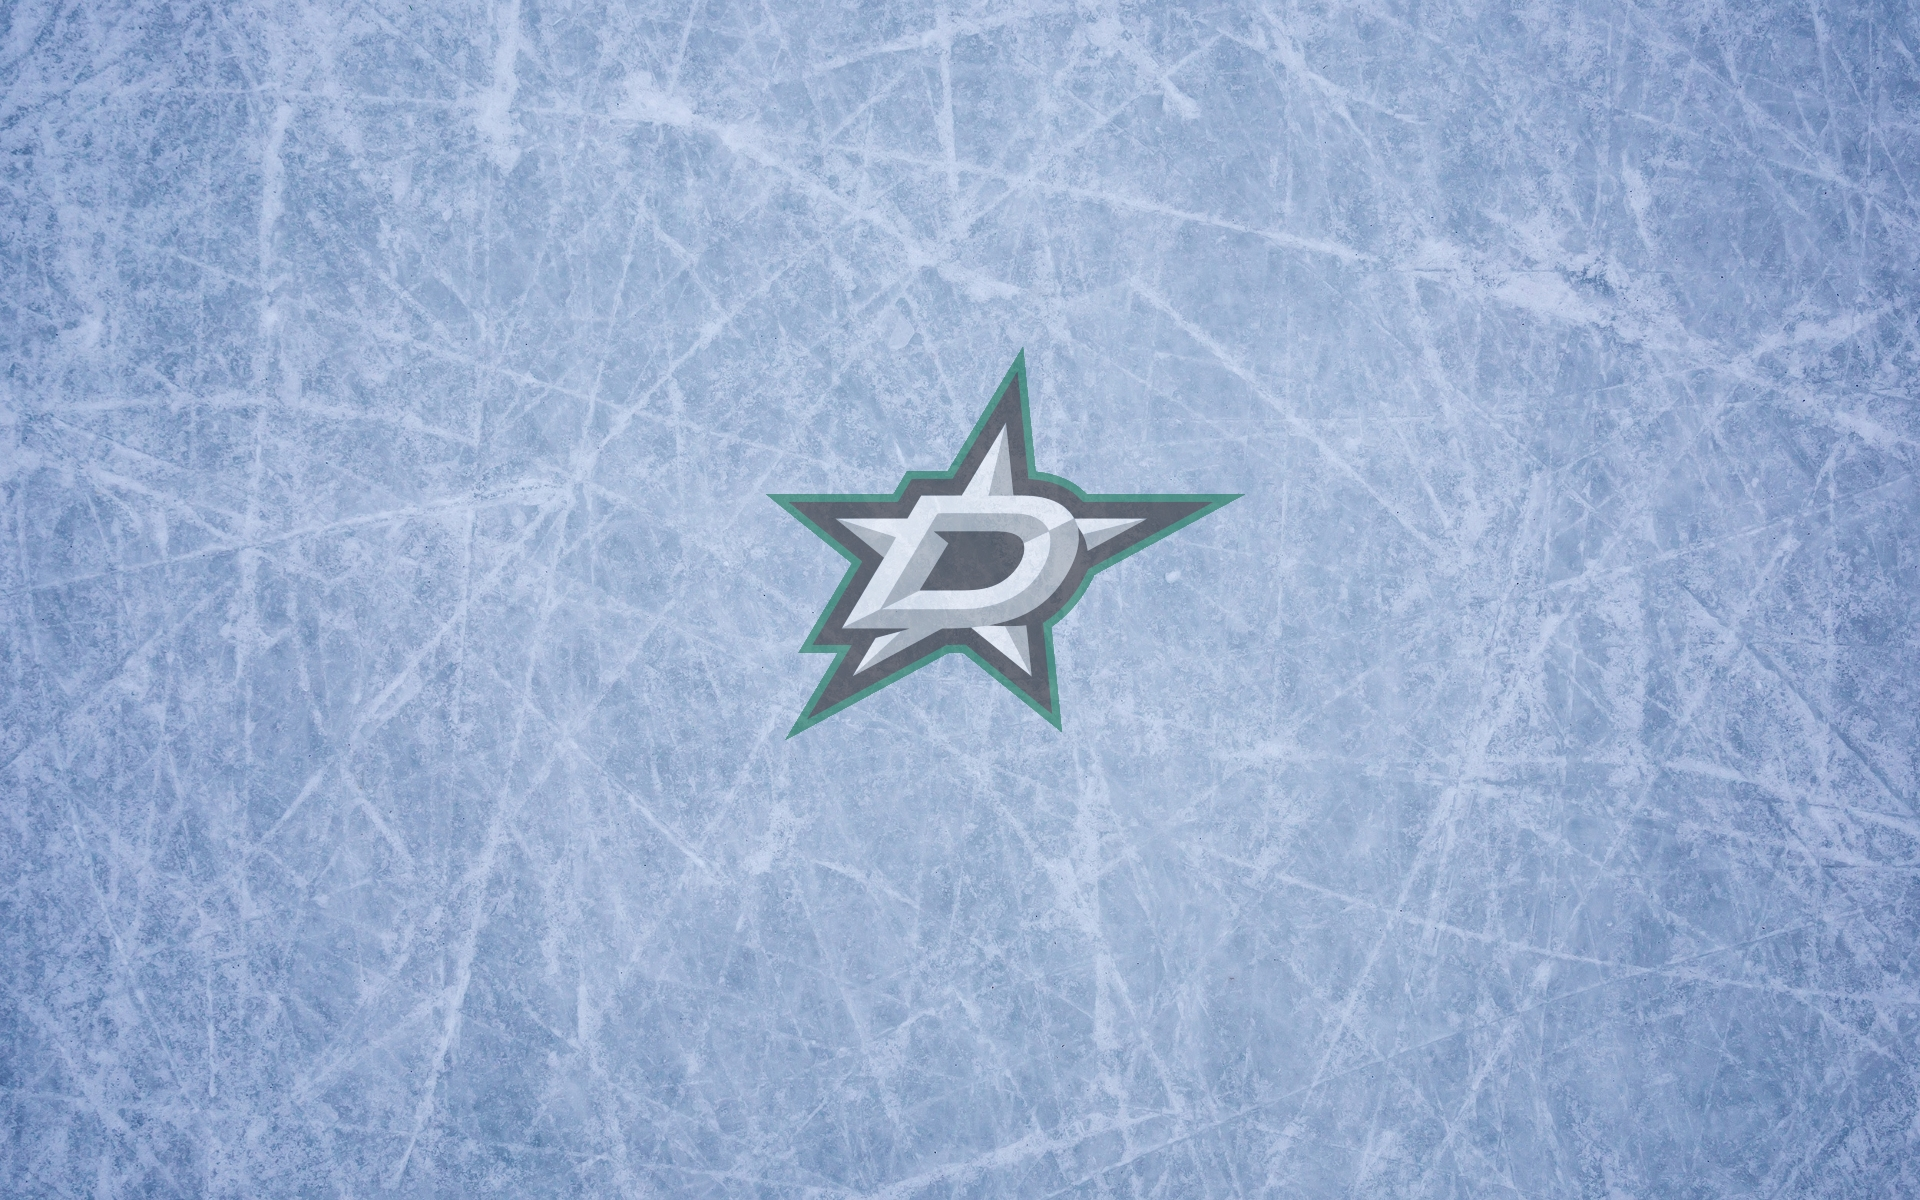 Dallas Stars Wallpaper 2014 Dallas Stars – Logos...